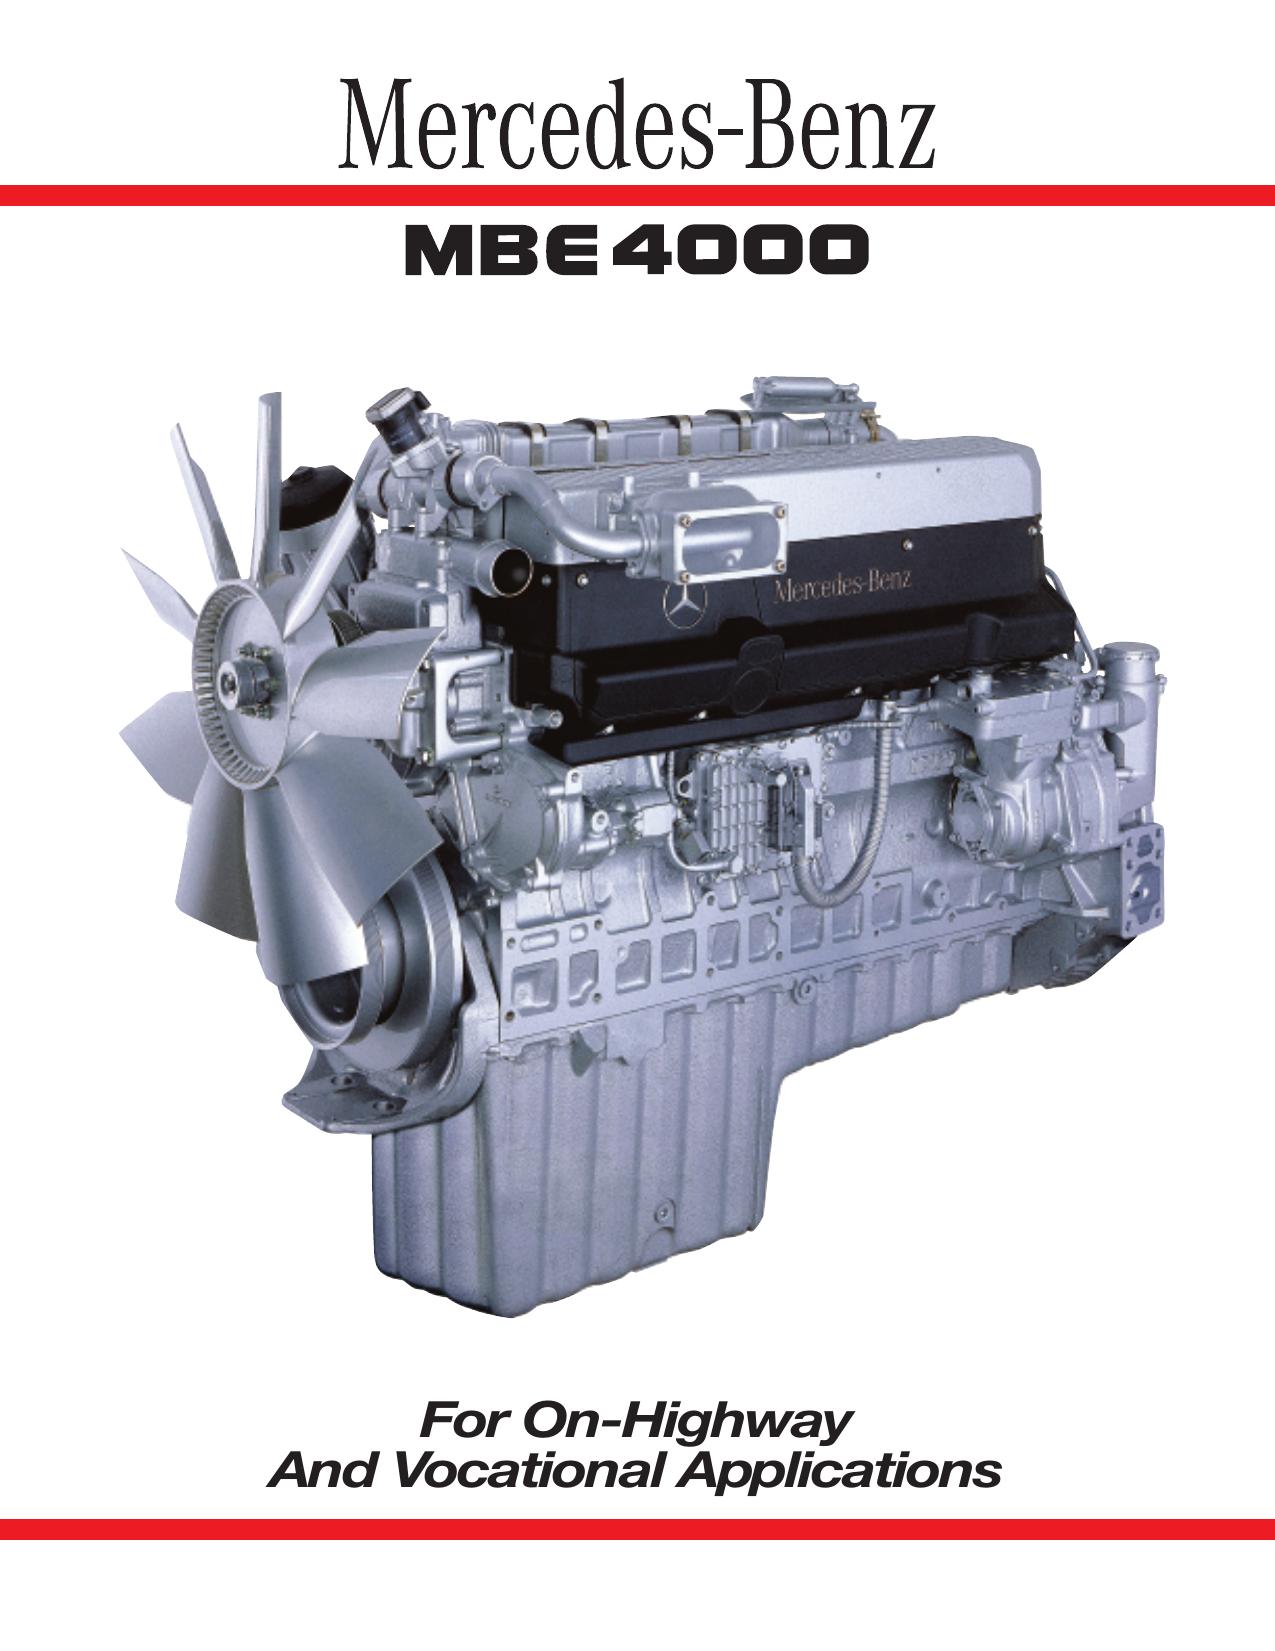 MBE 4000 Brochure 6SA580 qxd | manualzz com